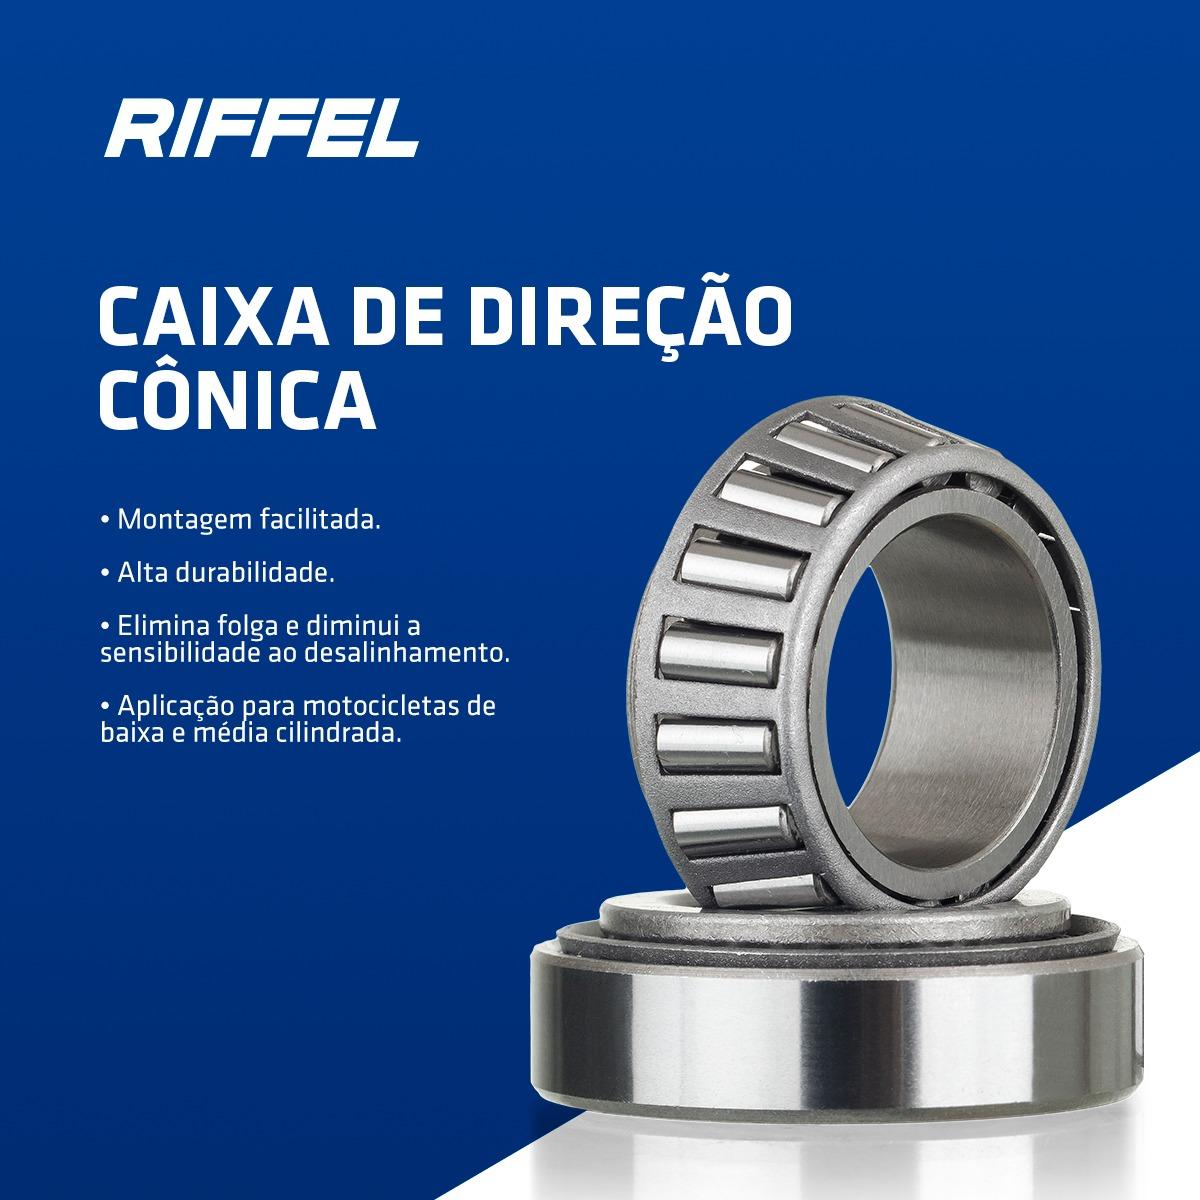 Caixa de Direção Cônica CG Titan/Fan 125/150/160 CG 150 Cargo (09-15) CBF 125/150 / eco deluxe